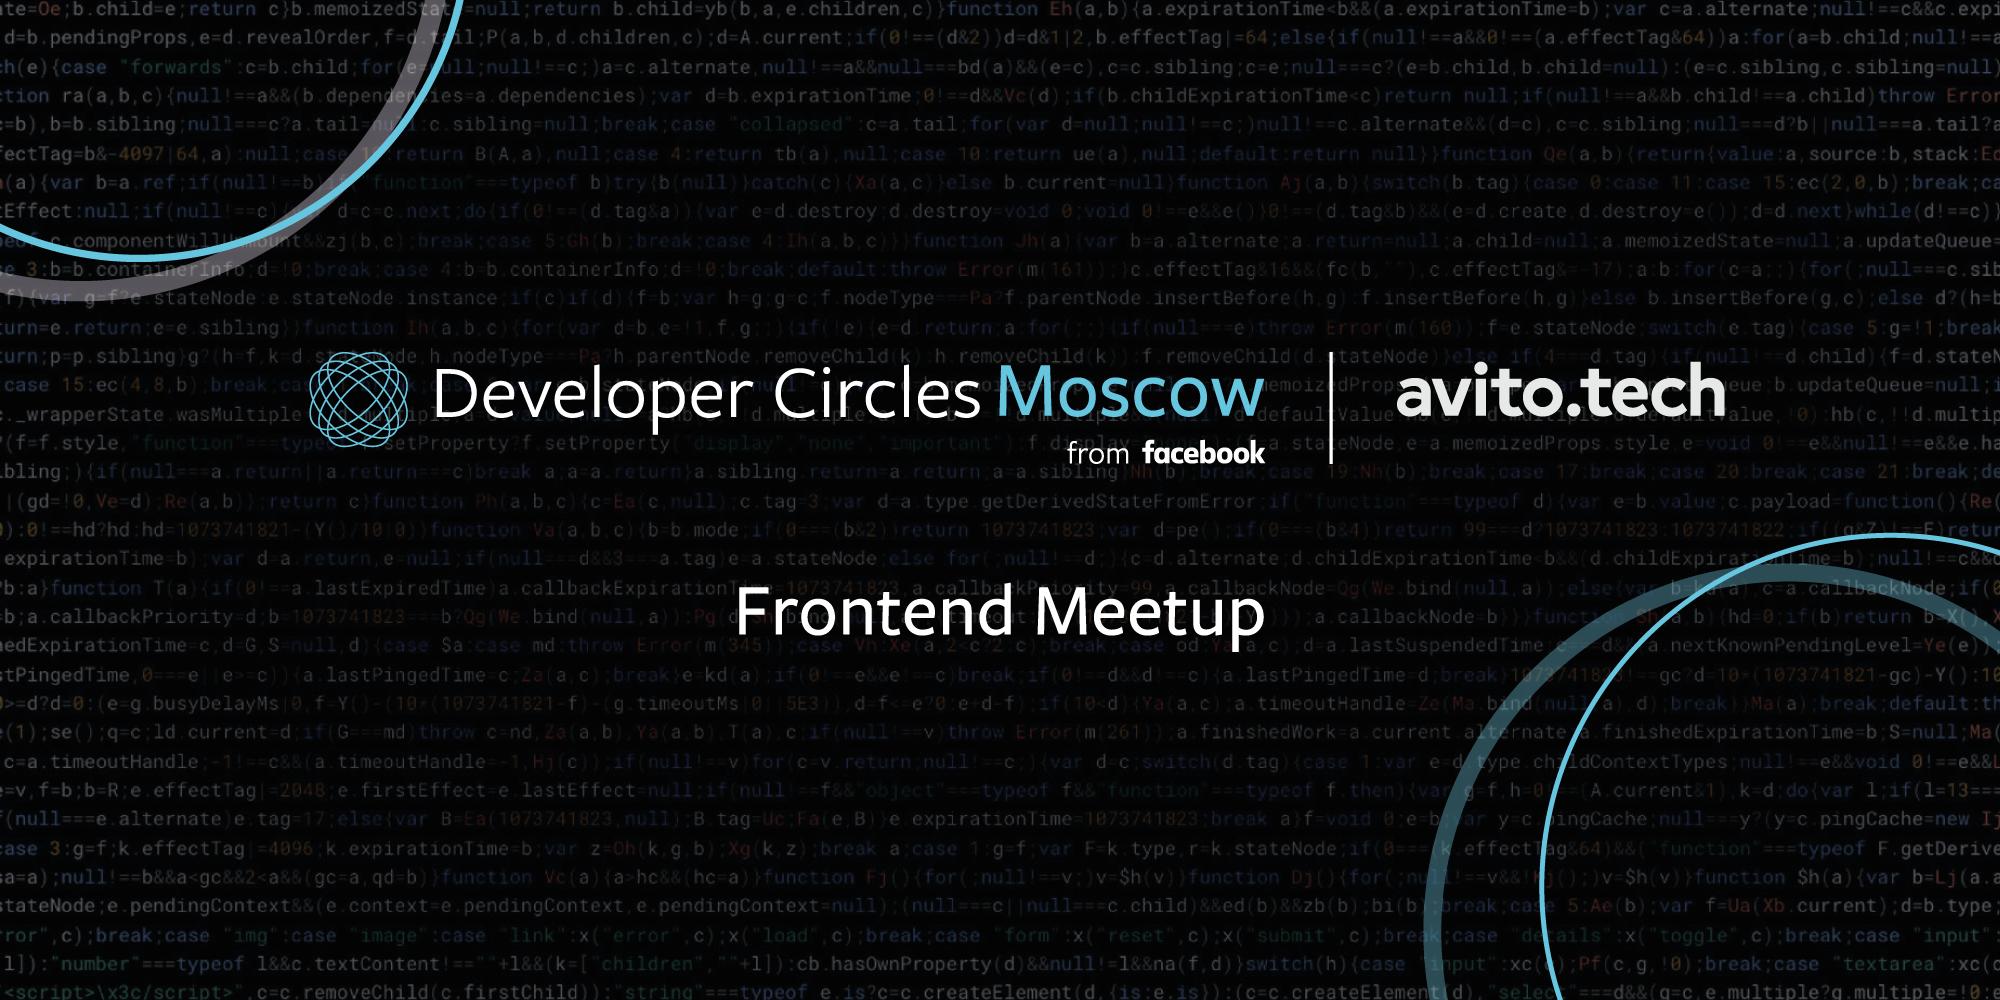 Фронтенд митап Facebook и AvitoTech